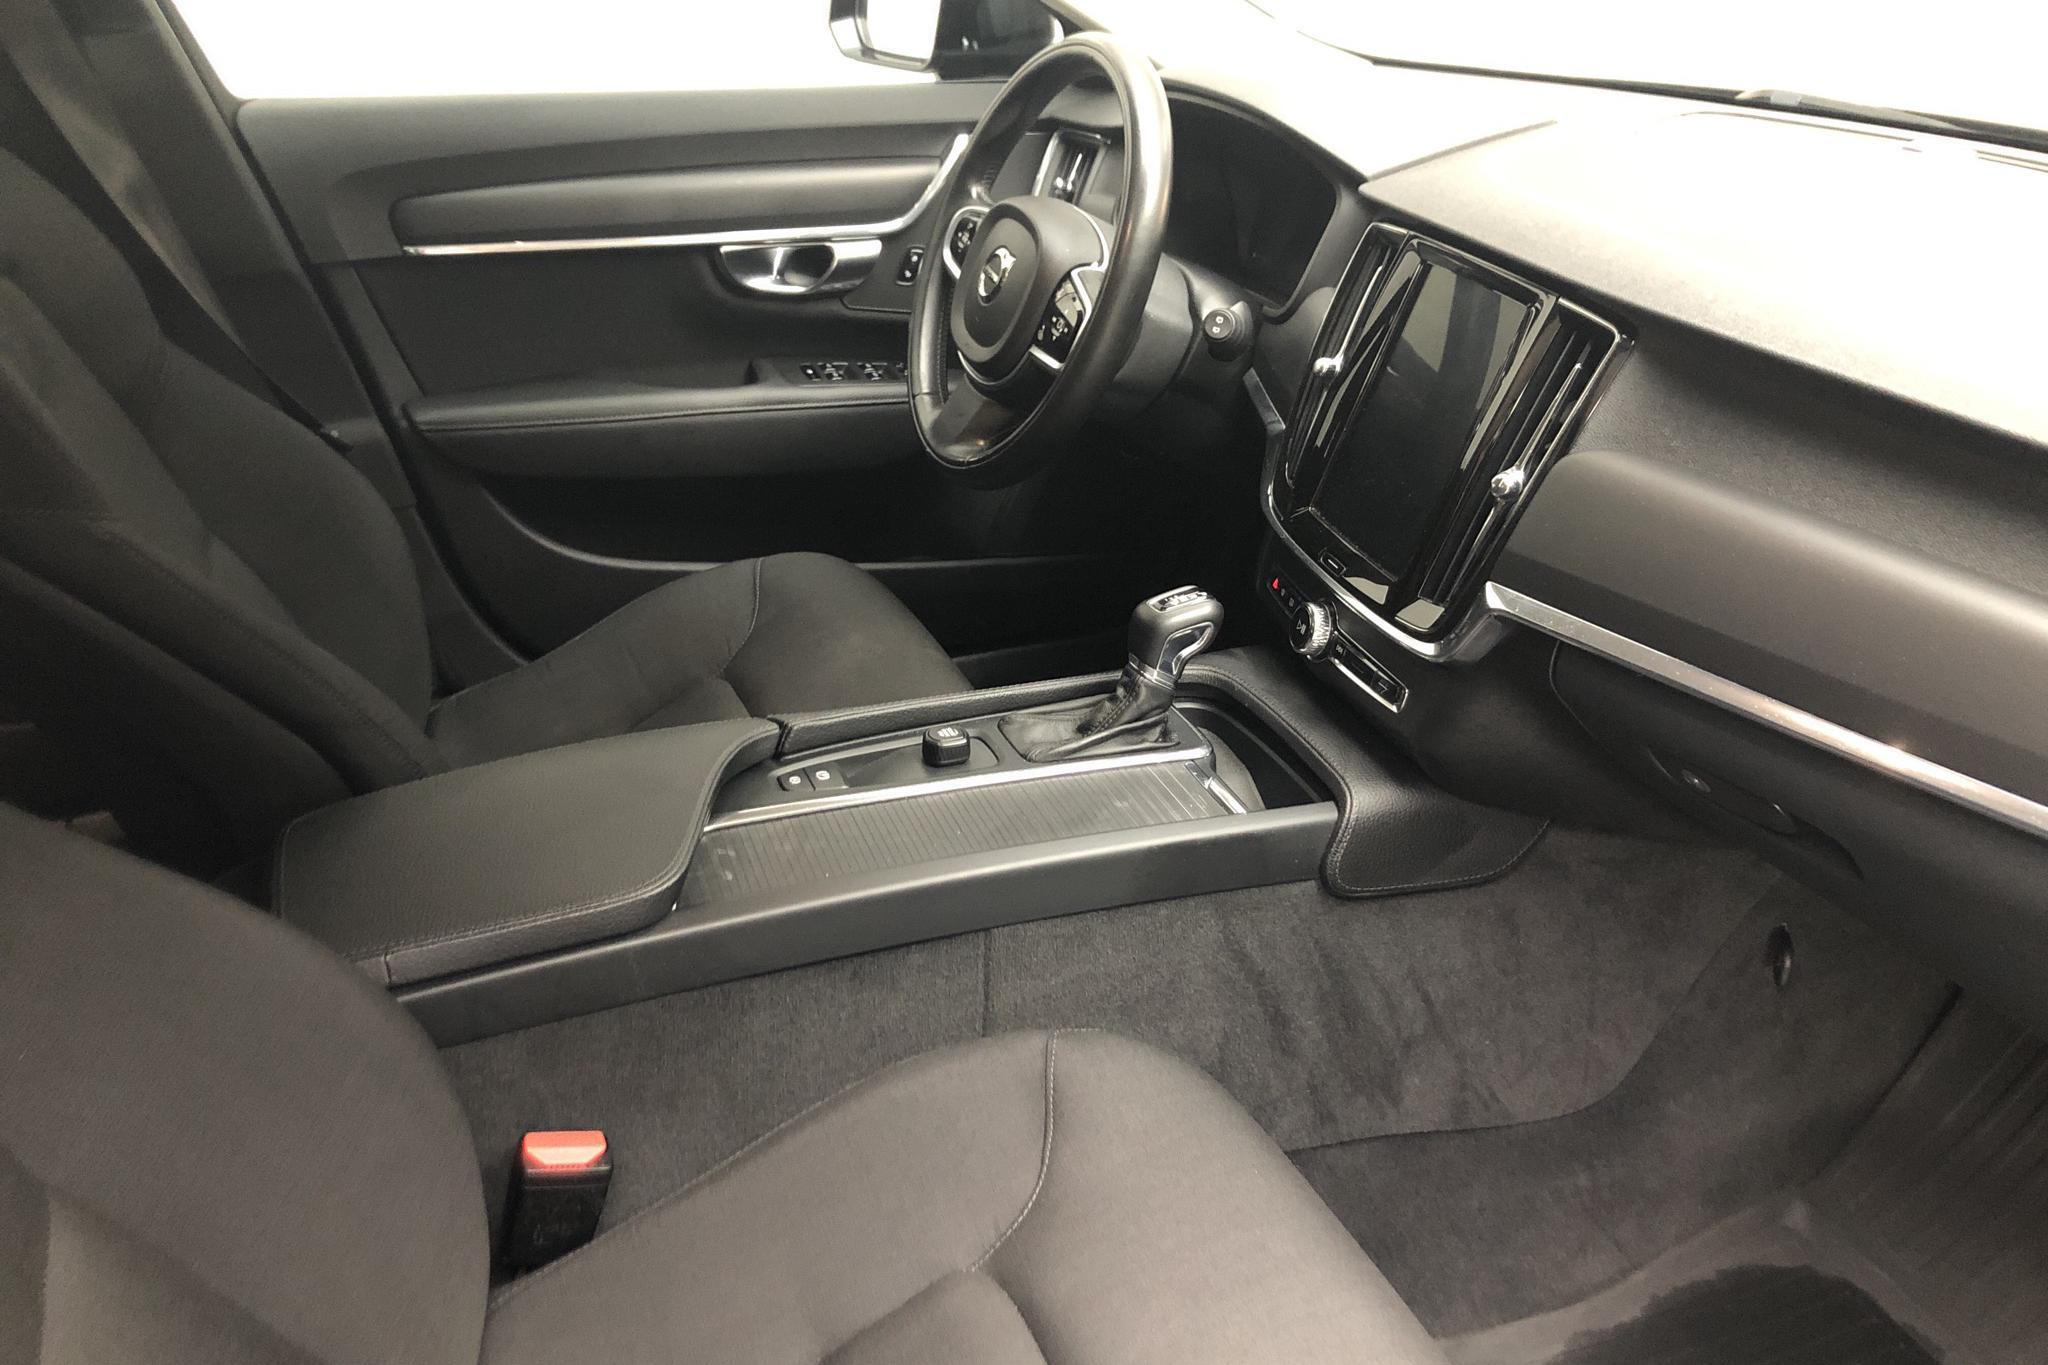 Volvo V90 D3 (150hk) - 99 950 km - Automatic - black - 2018